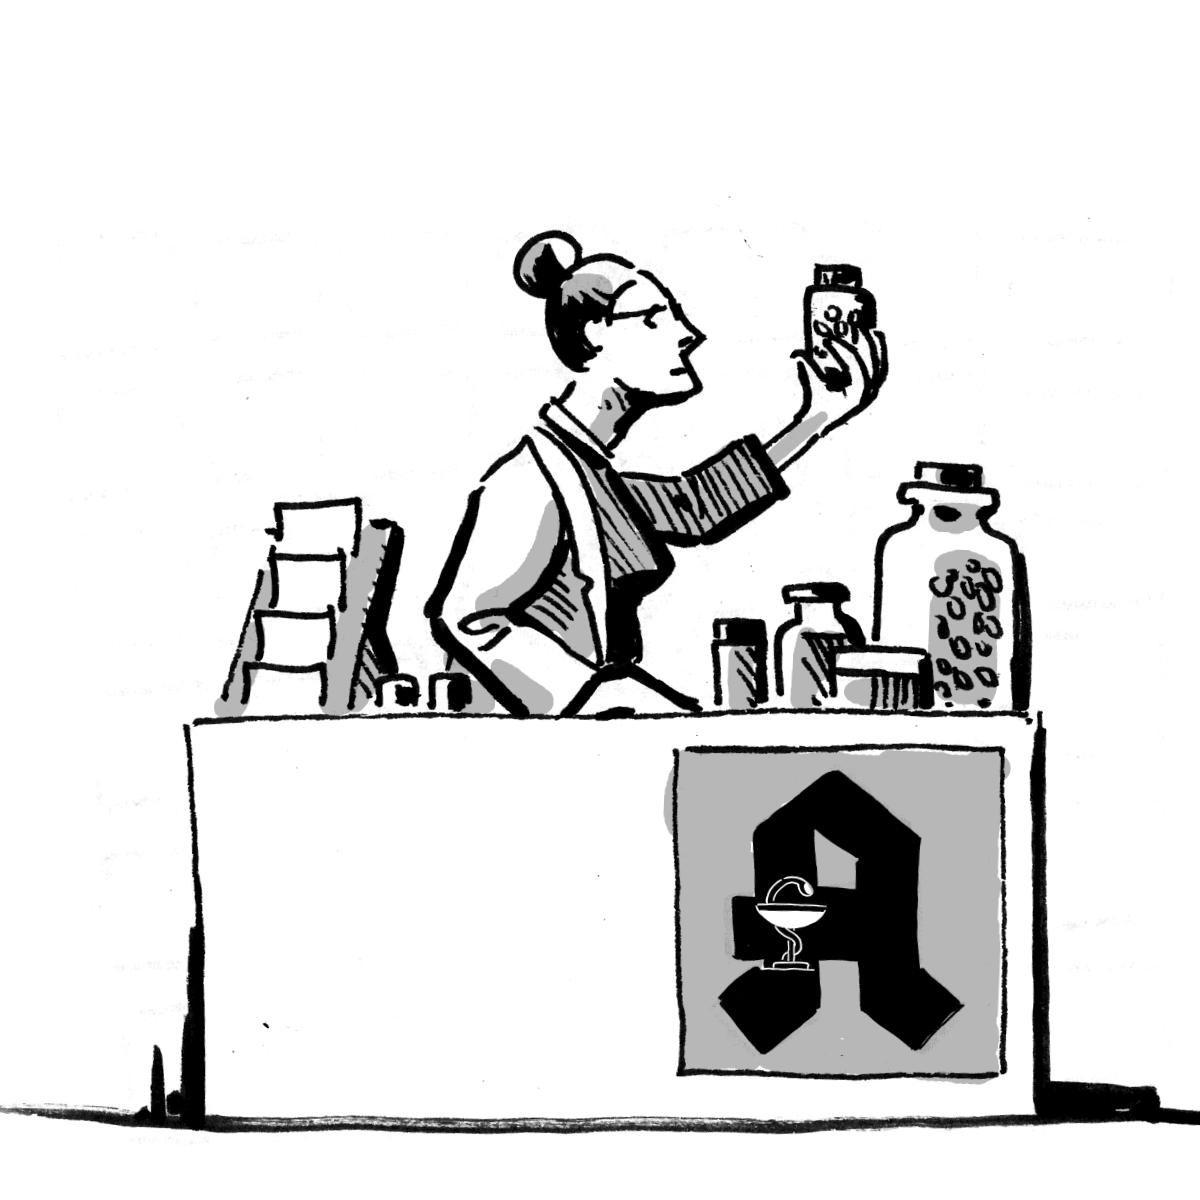 A11-apotheke-medicine-drugstore.jpg